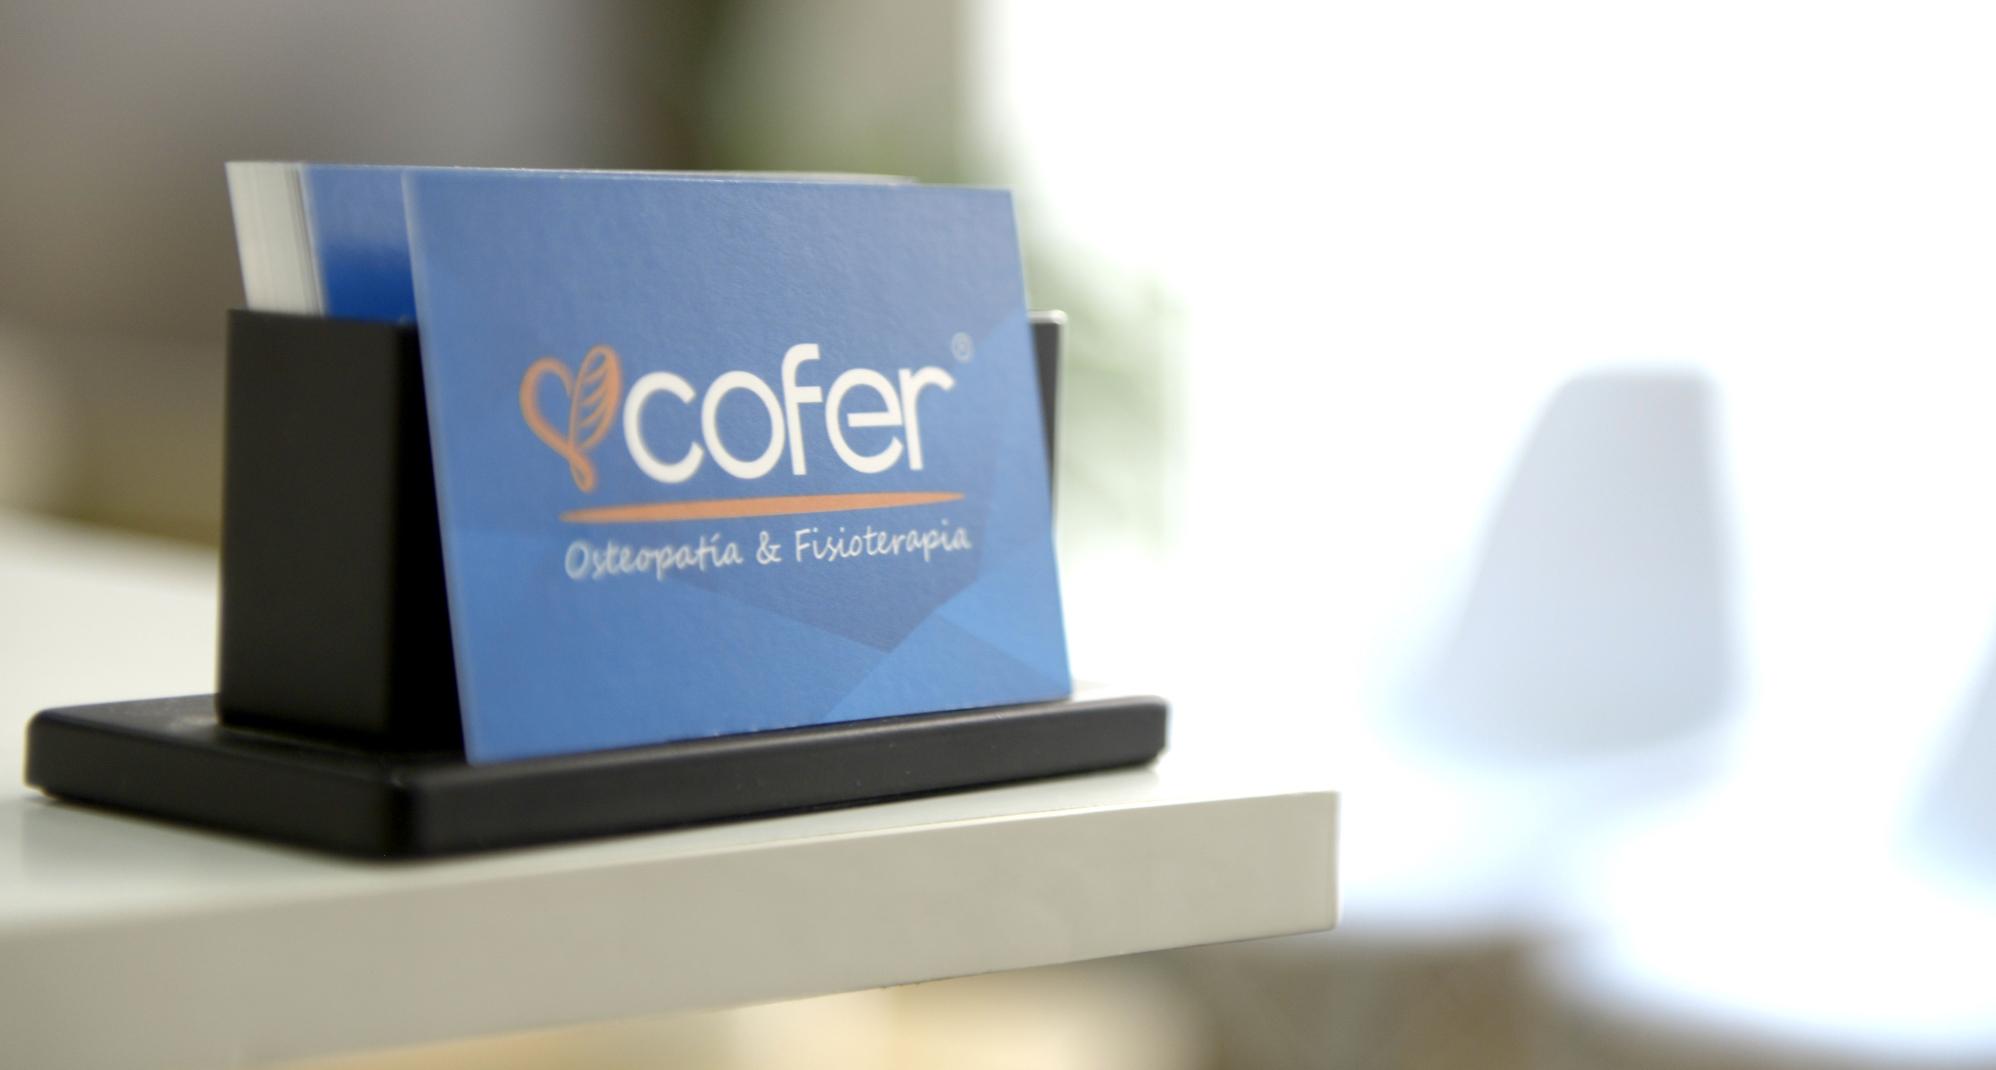 Clínica Cofer Fisioterapia y Osteopatía en Murcia